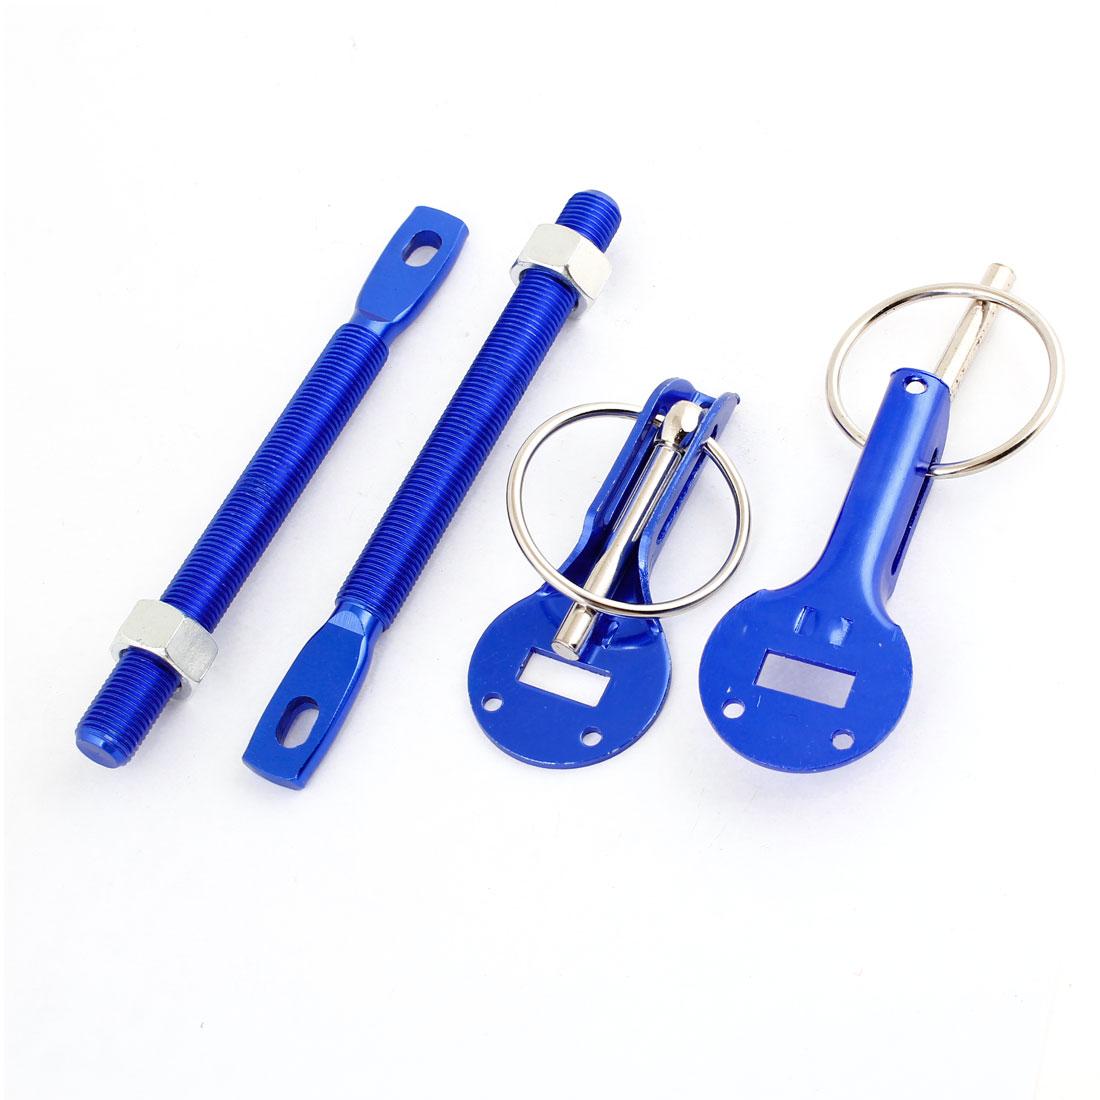 Metal Racing Hood Pin Latch Kit Lock Tool Set Blue Silver Tone for Car